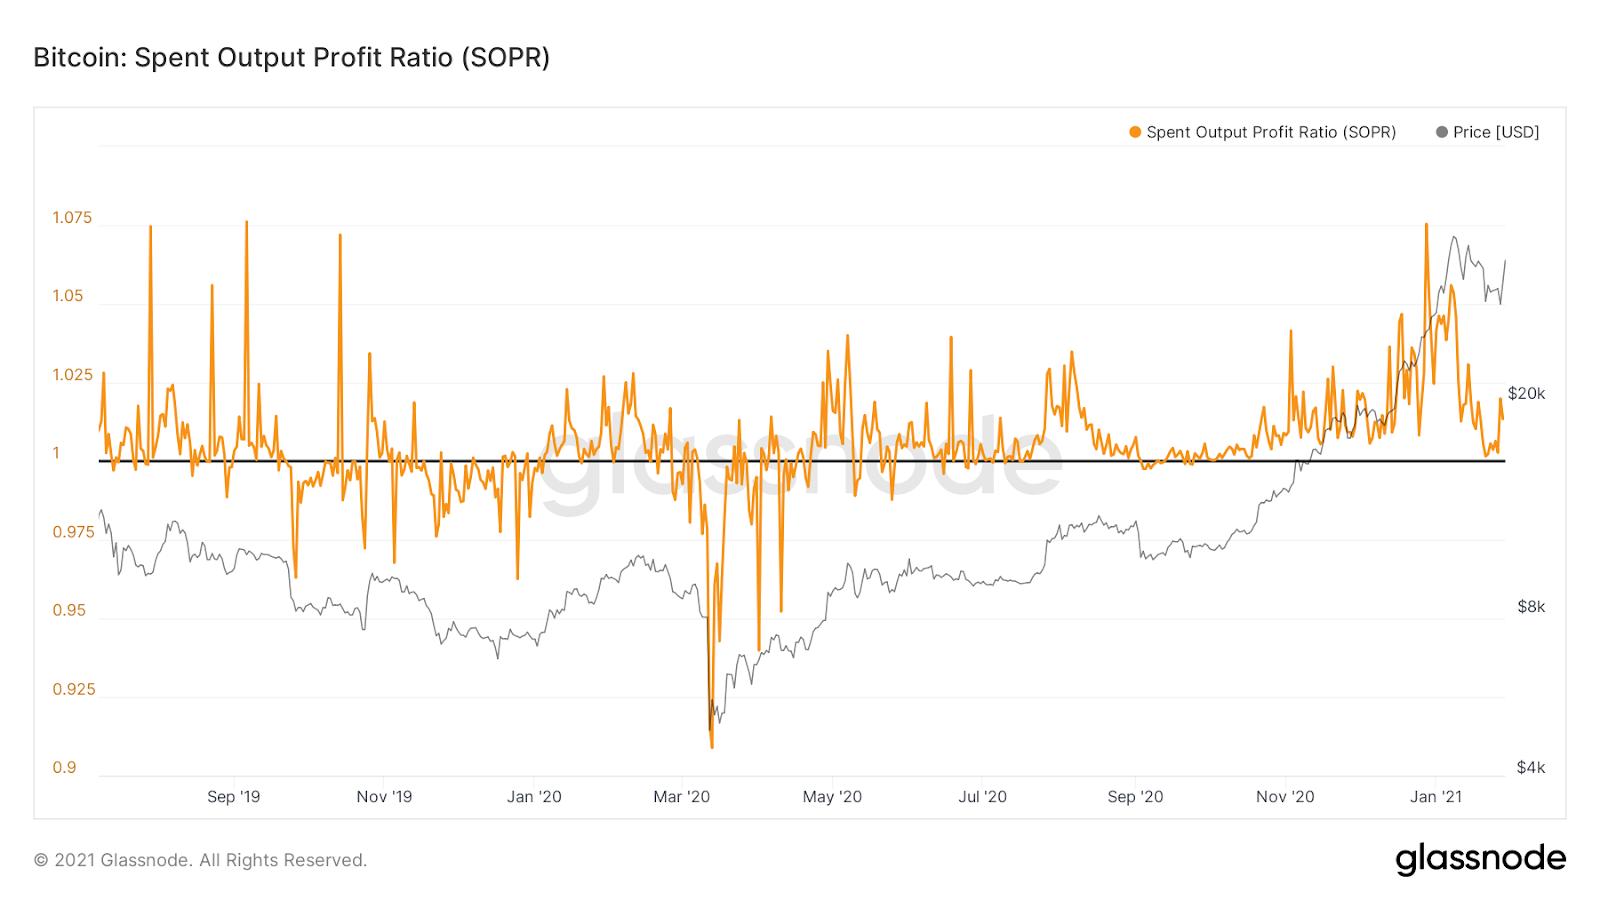 Bitcoin SOPR ratio. Source: Glassnode